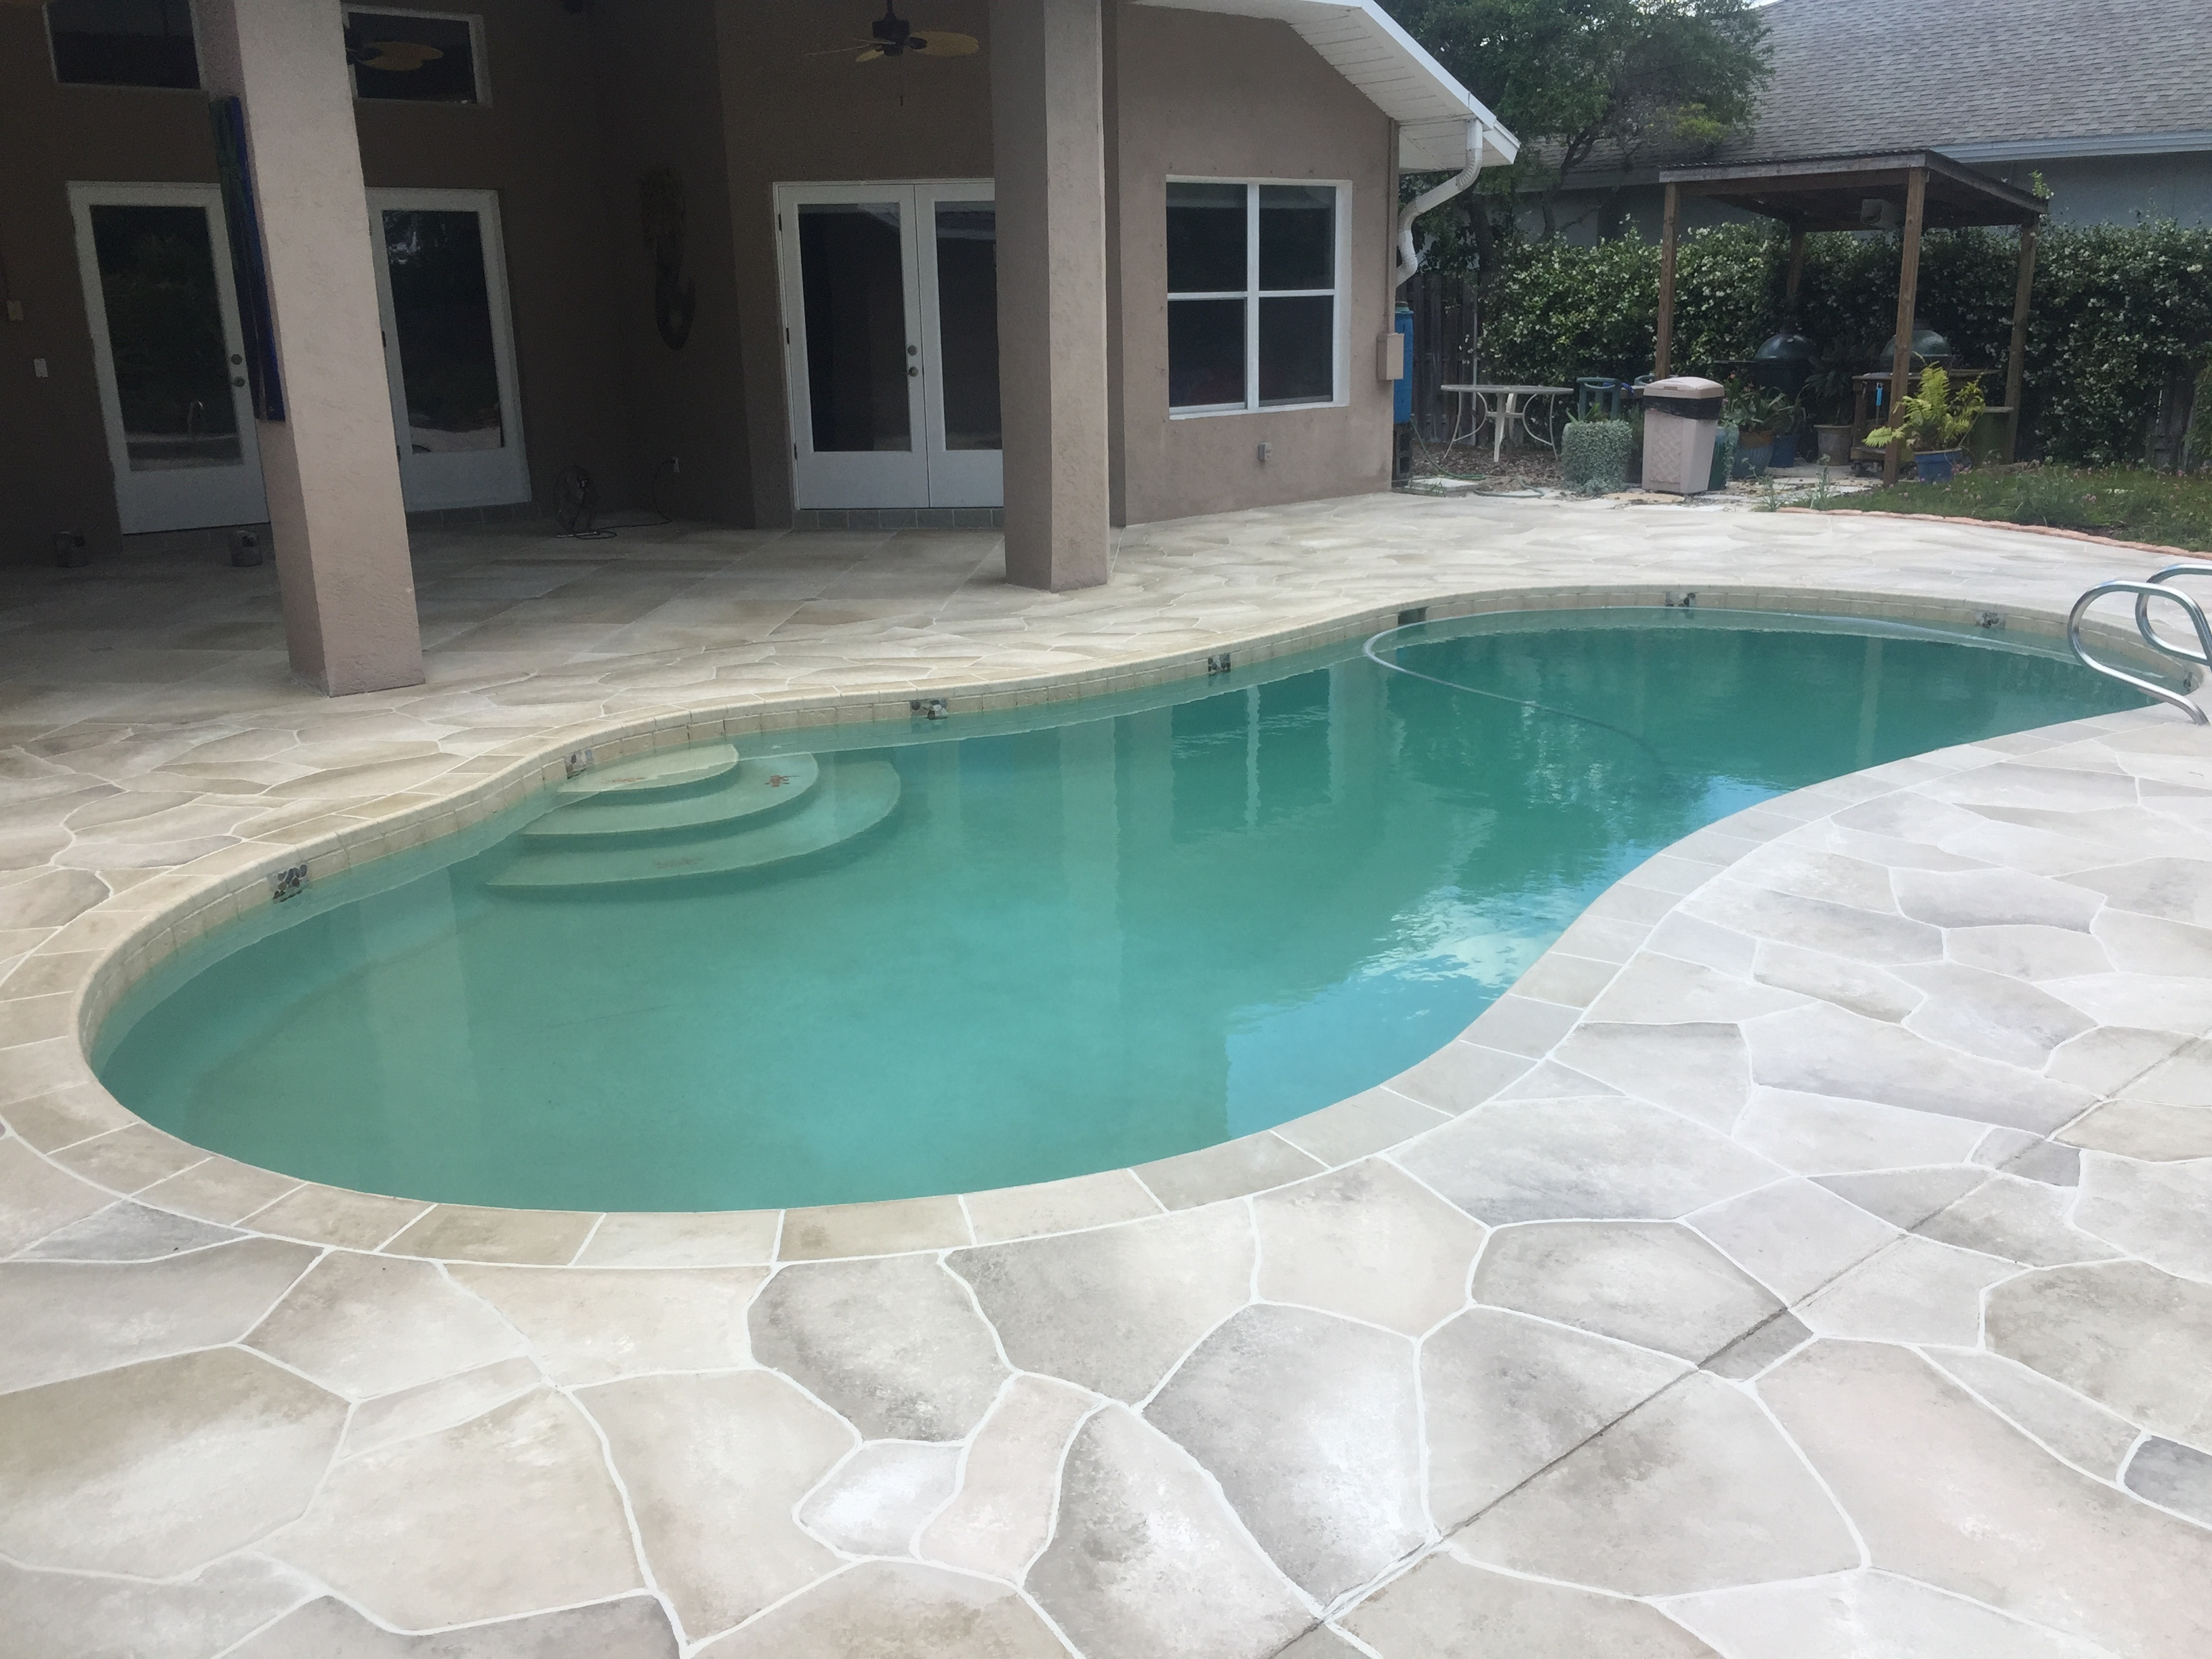 Concrete Designs Florida Flagstone And Travertine Tile Pool Deck Inside  Dimensions 3264 X 2448